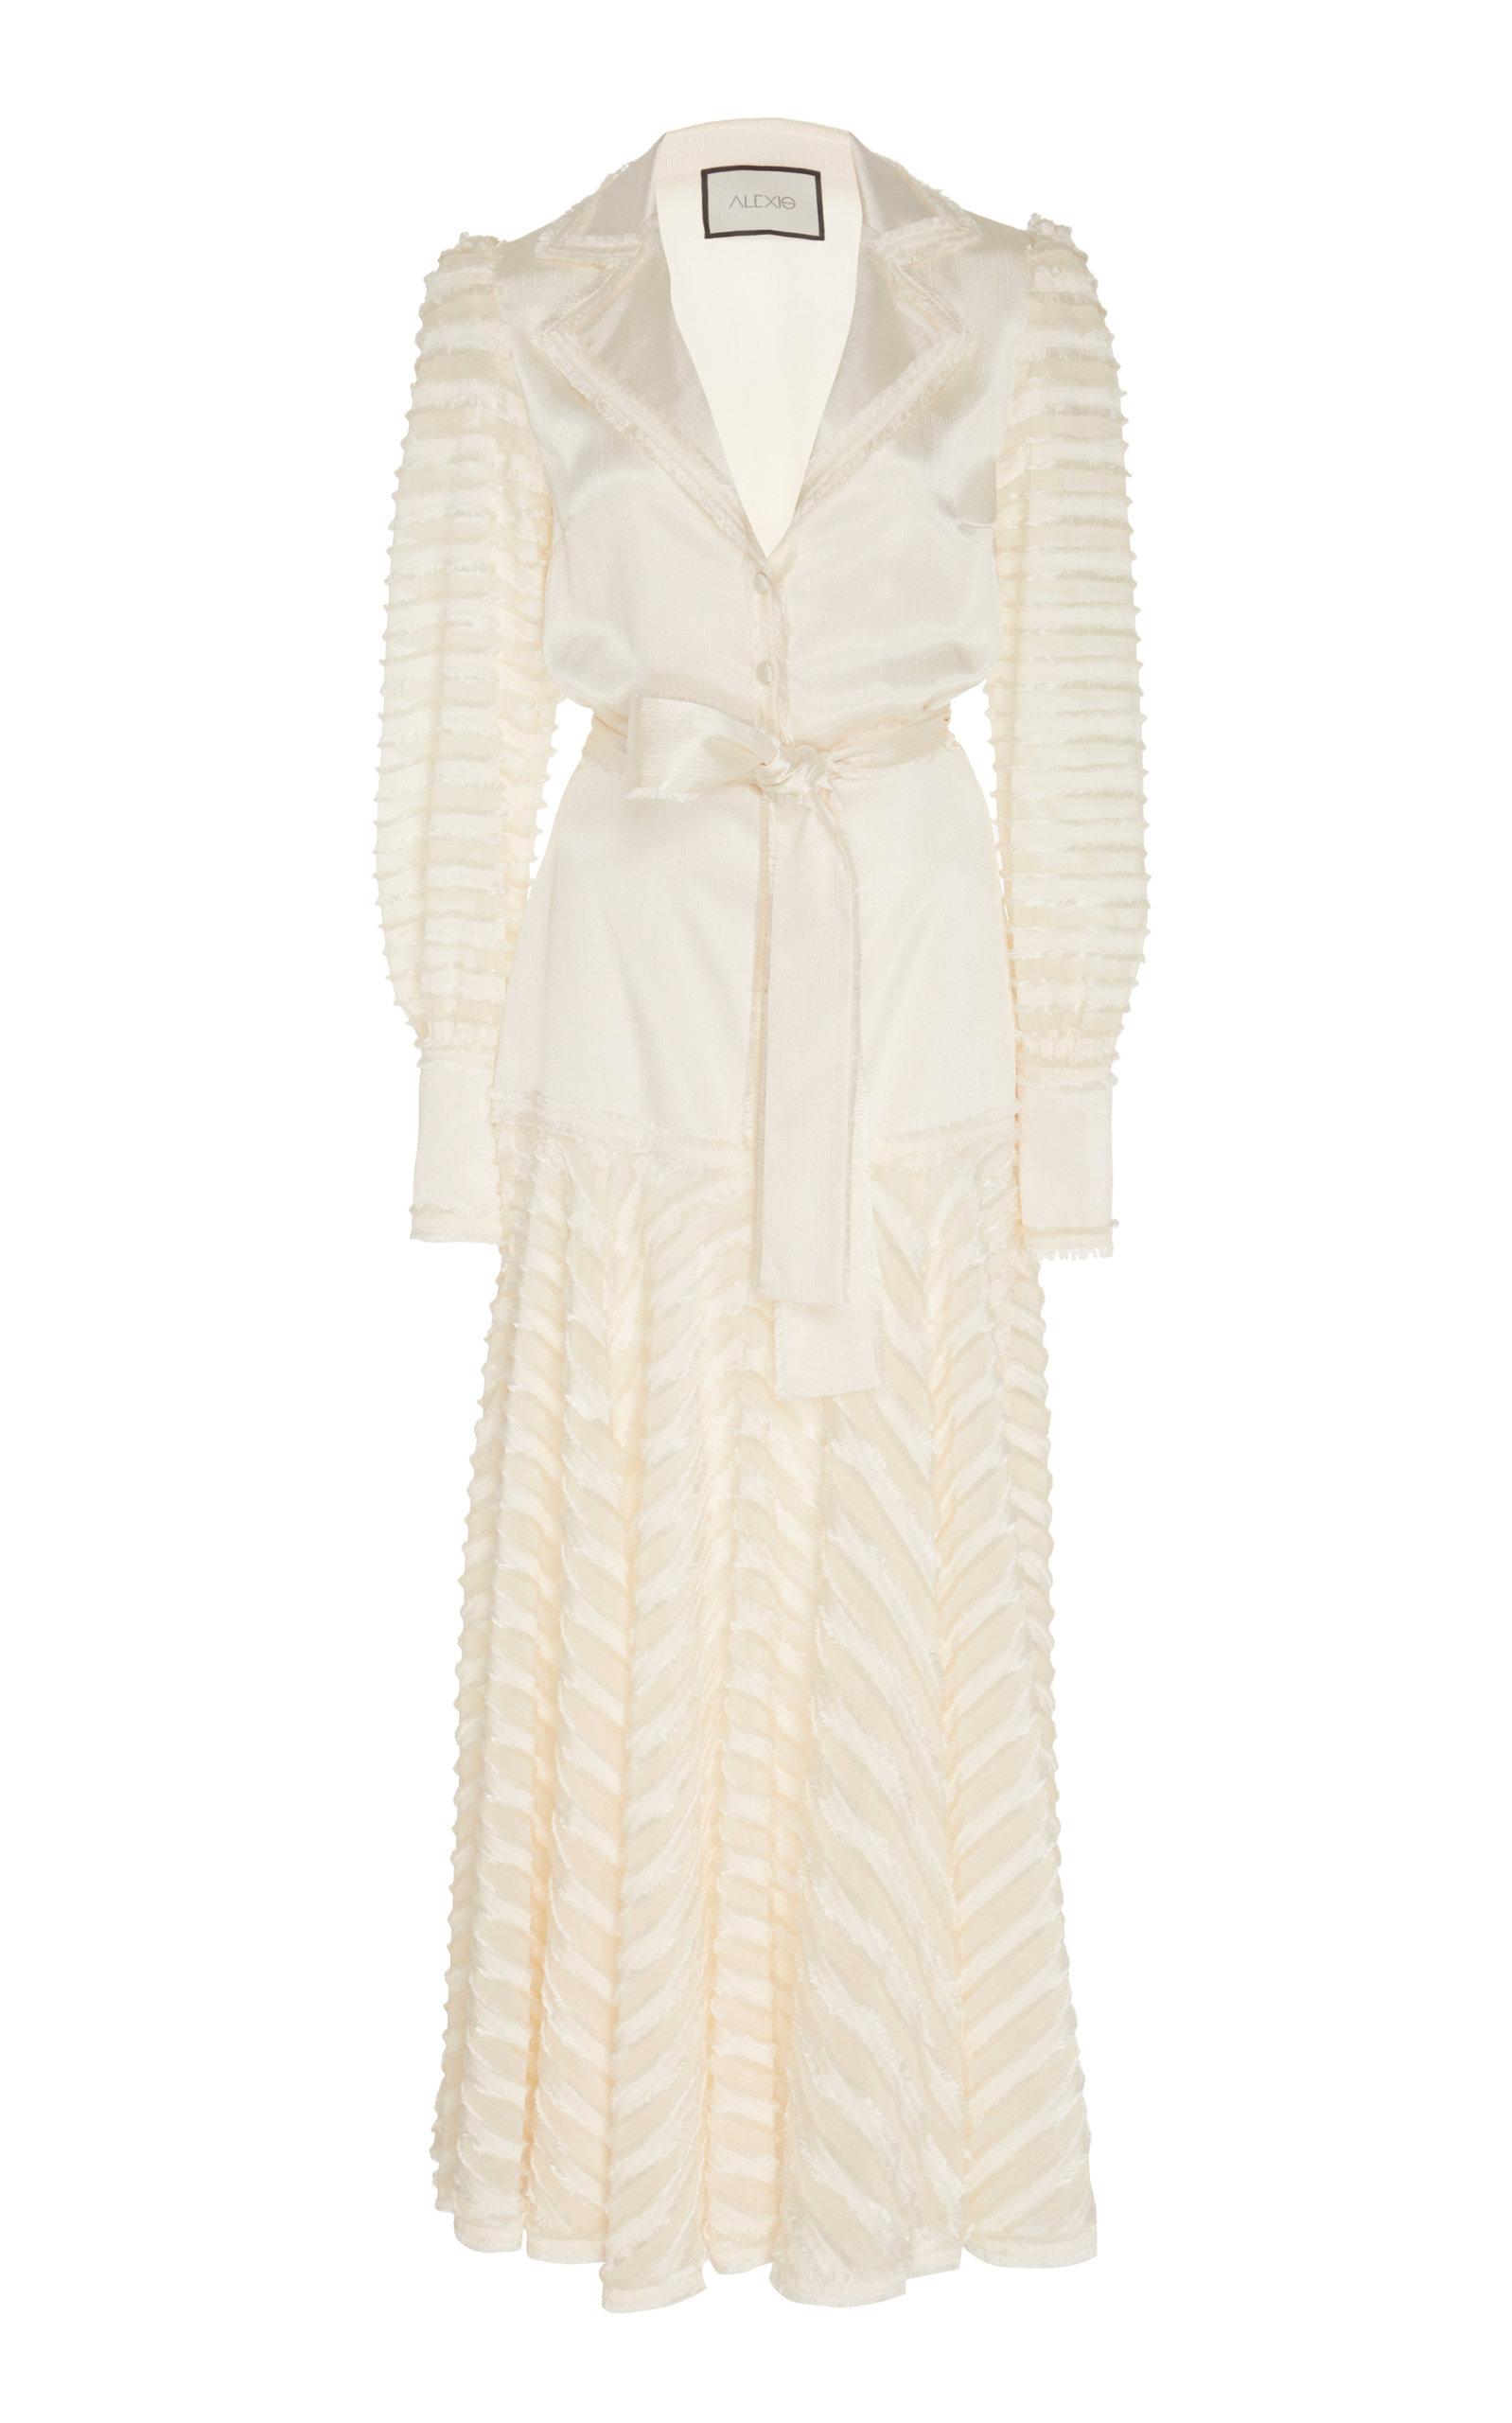 943cab945132c Juliska Sheer-Paneled Maxi Blazer Dress by Alexis | Moda Operandi